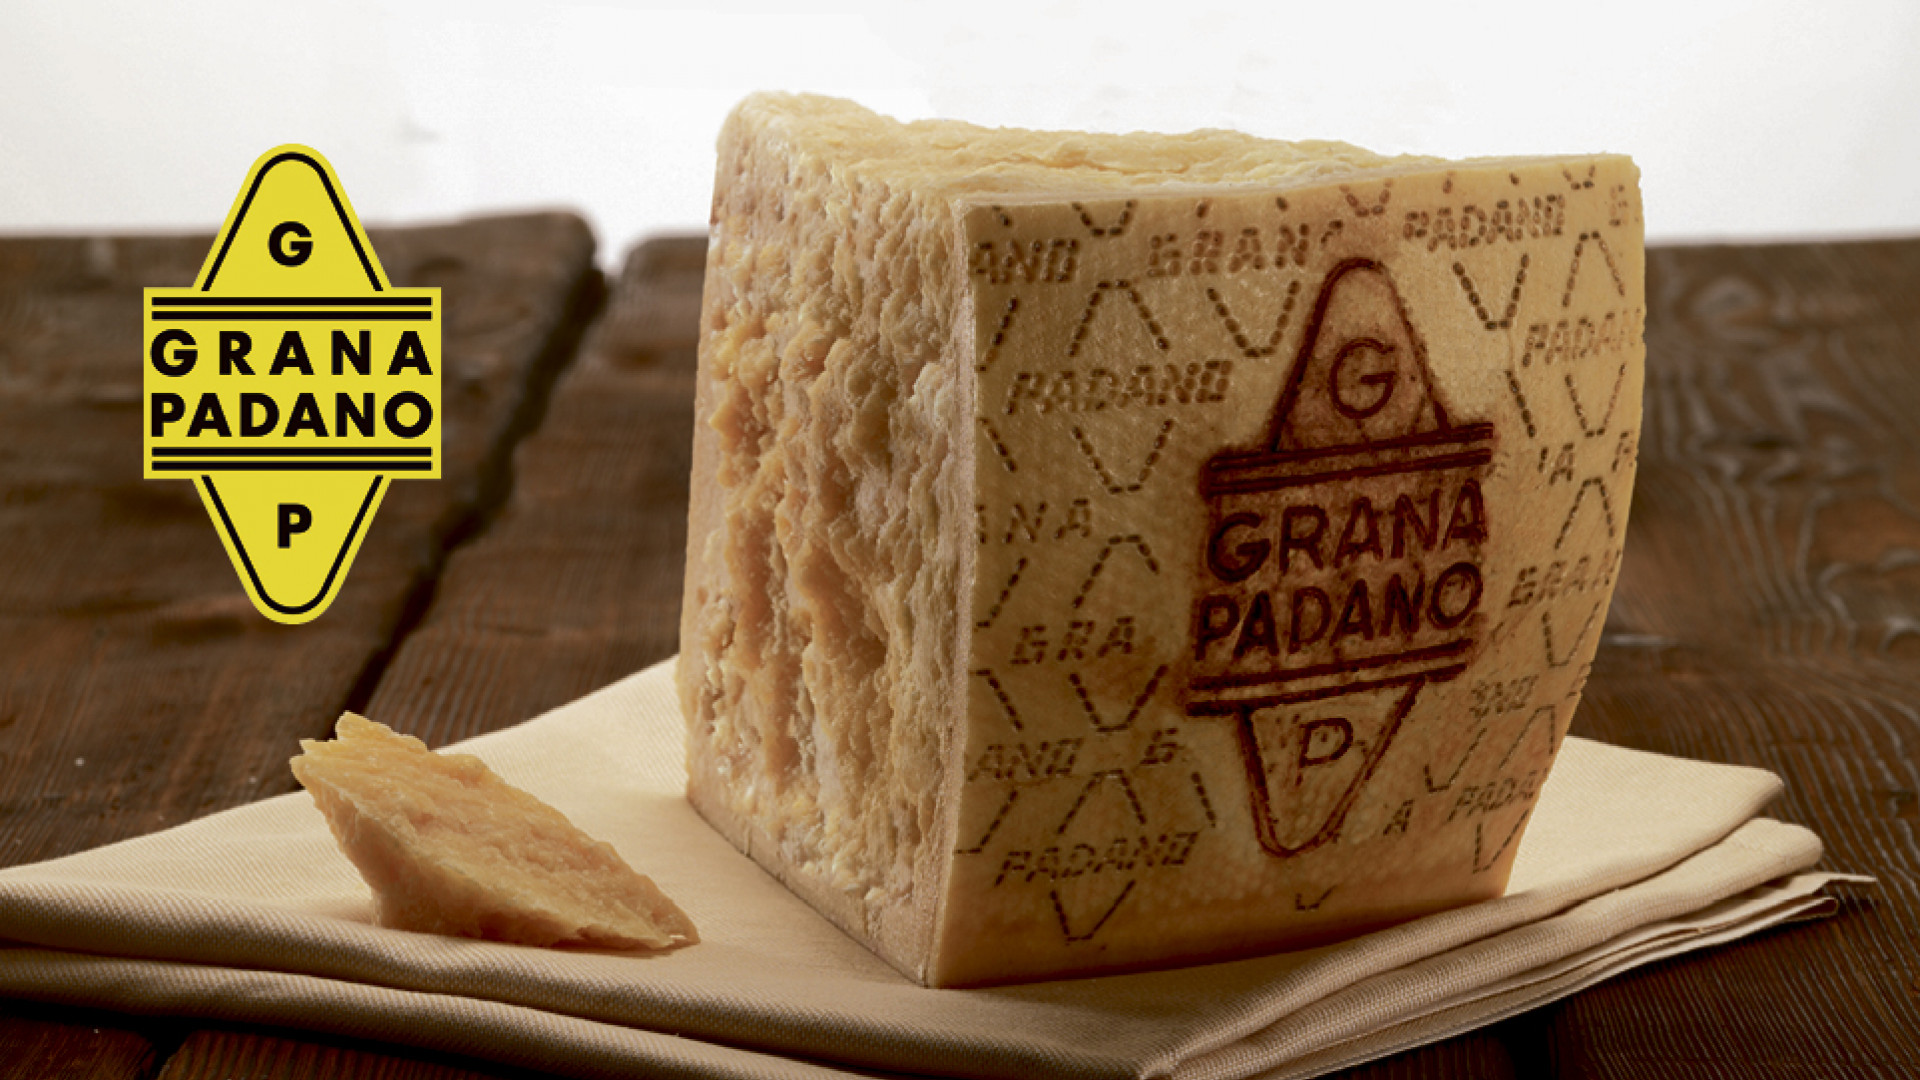 Grana Padano cheese on a rustic wood table